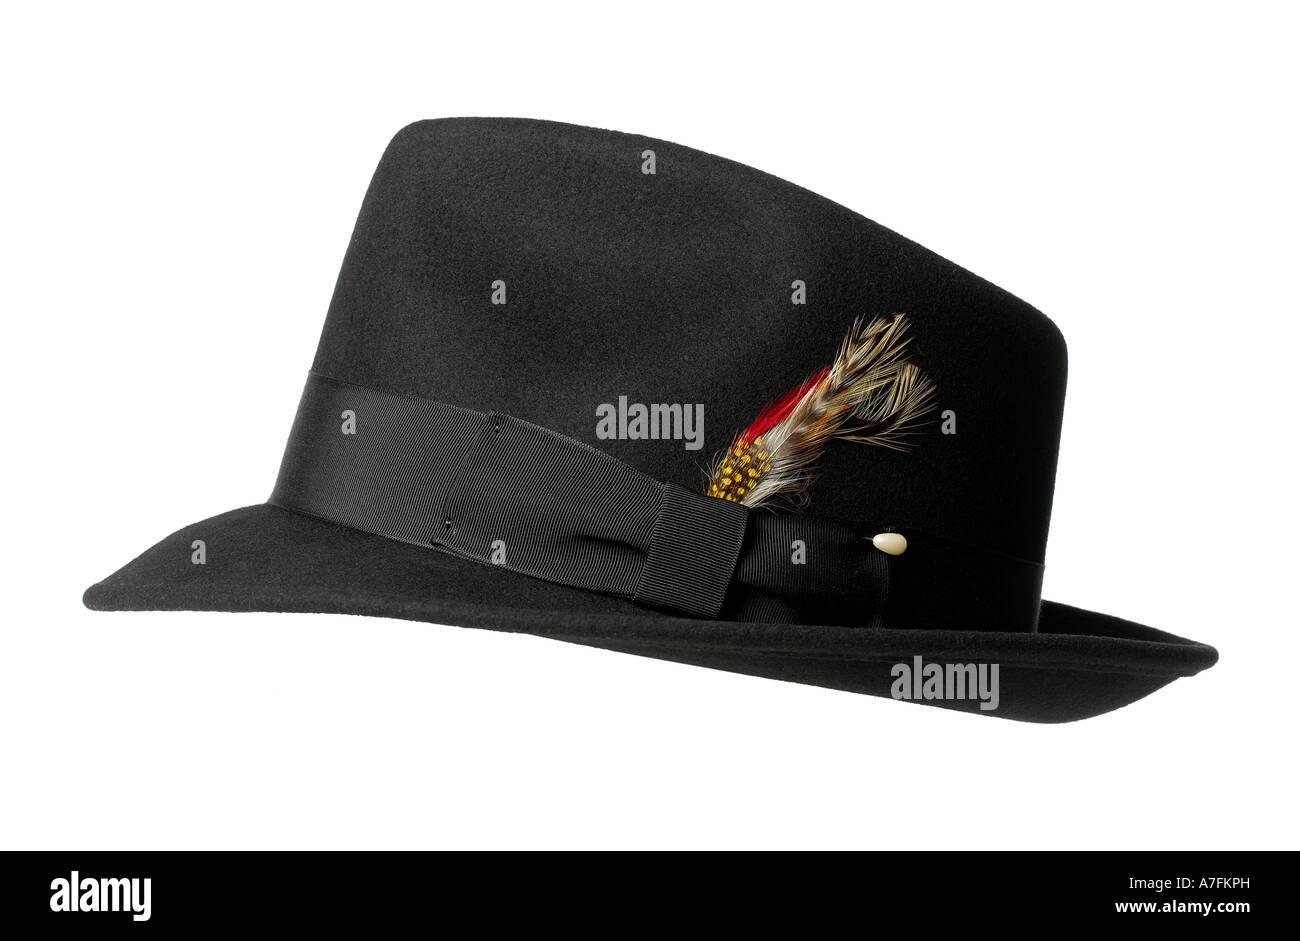 8fe468d1b88eb Men s Black Felt Fedora Hat Feather Accessory Stock Photo  11826232 ...